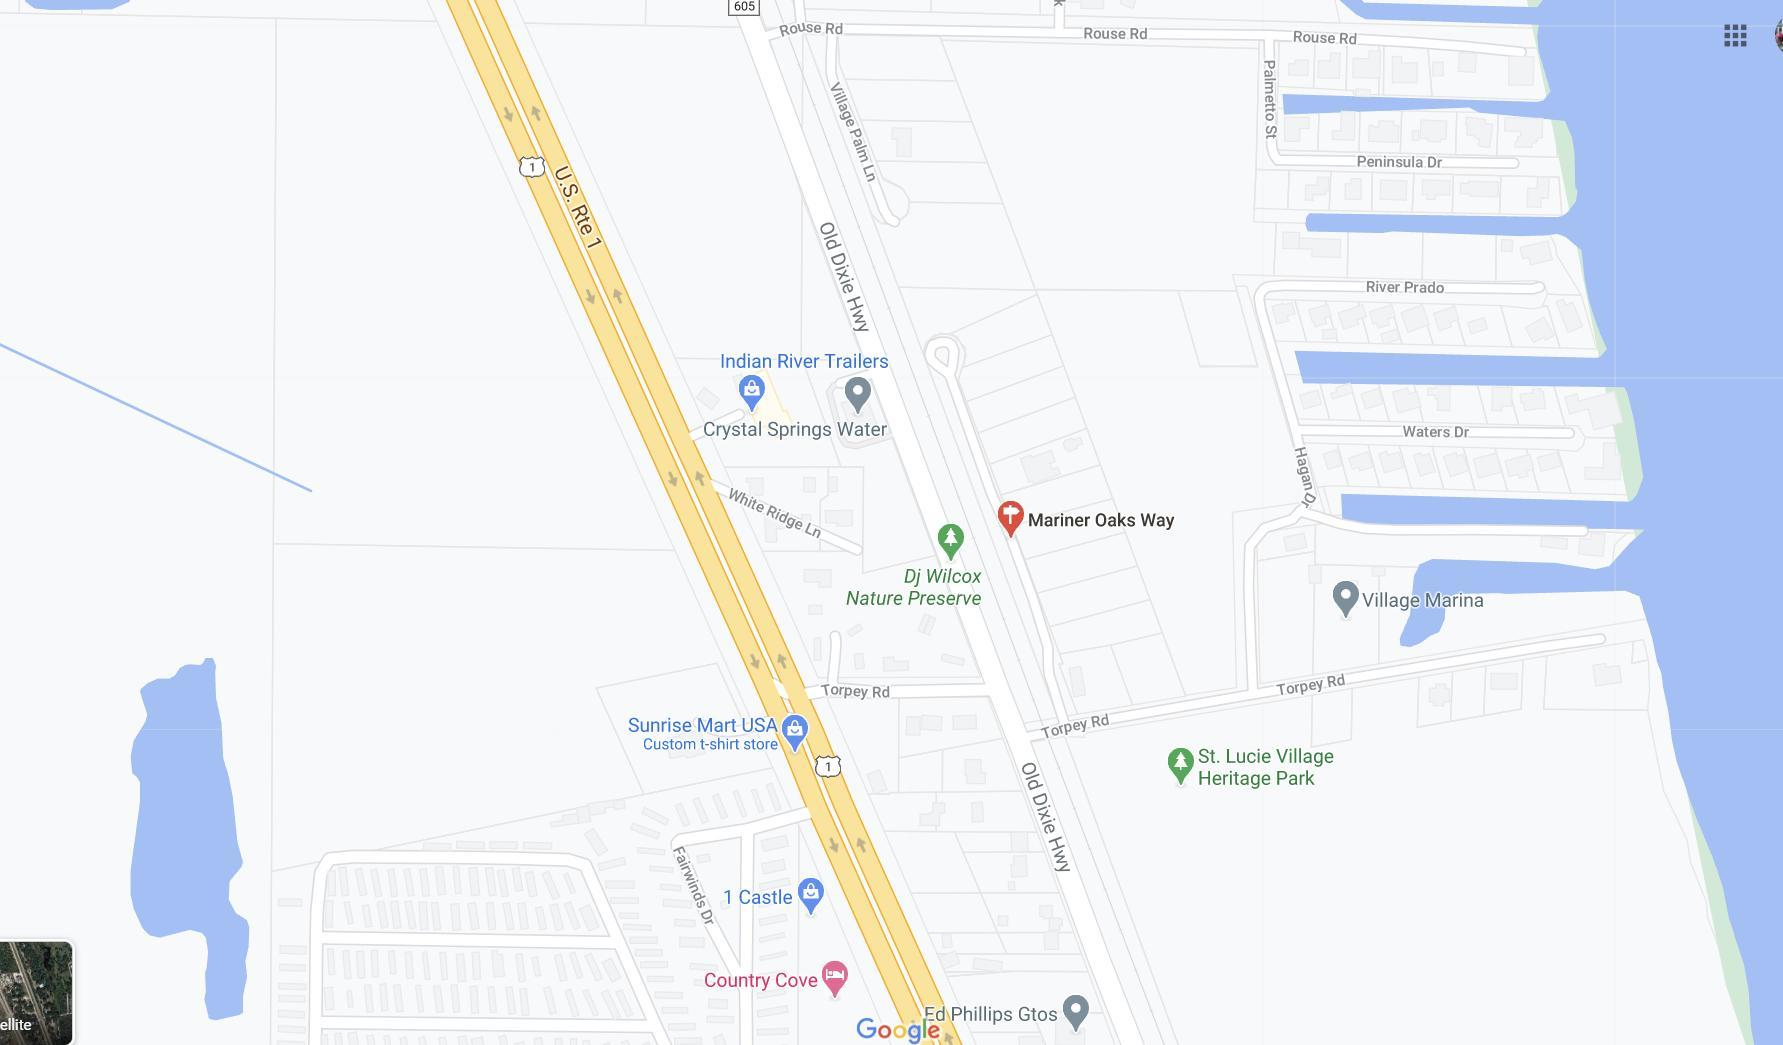 0004 Mariner Oaks Way, Fort Pierce, FL 34946